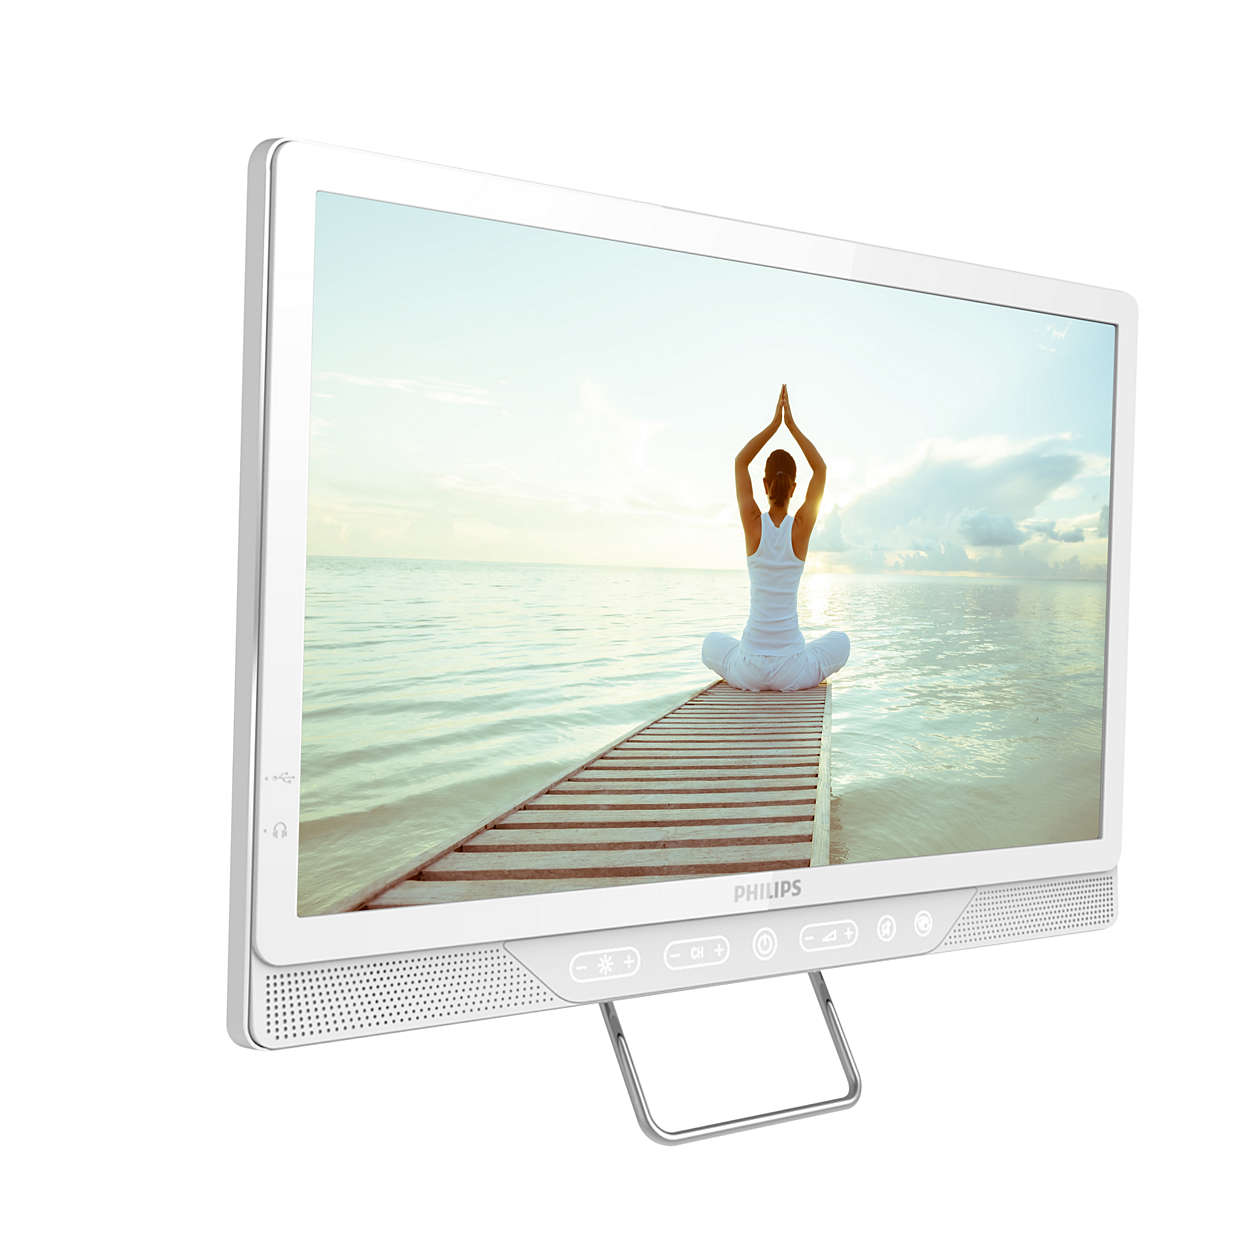 Et unikt natbords-TV